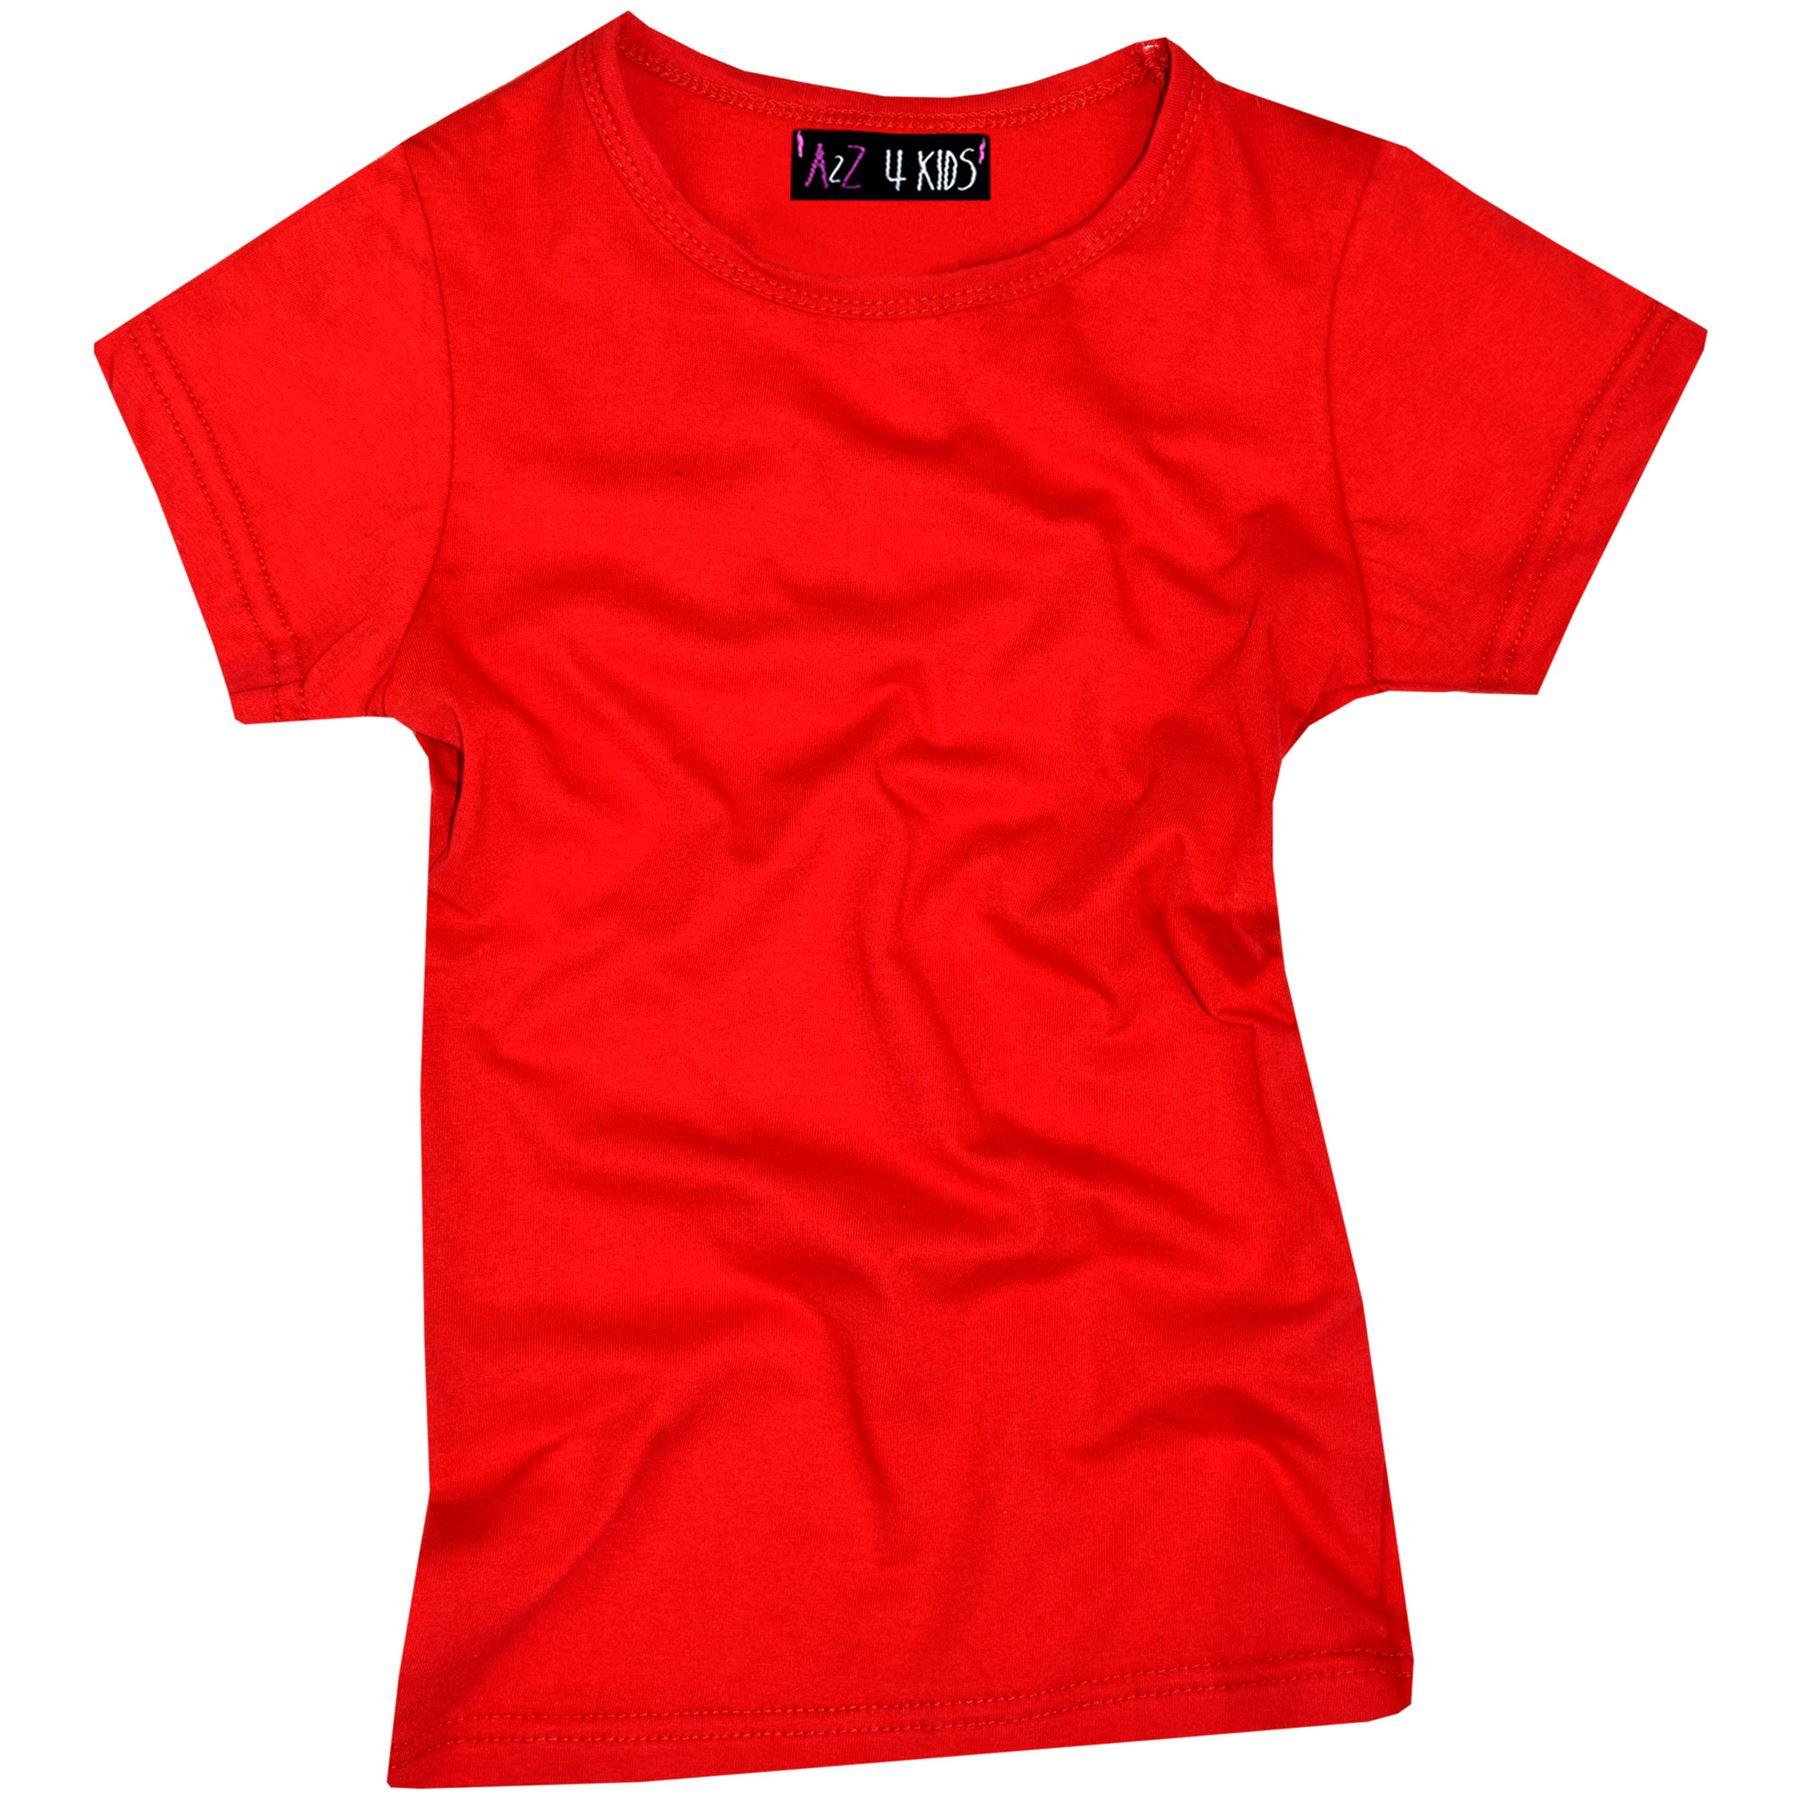 Kids-Girls-T-Shirts-Designer-100-Cotton-Plain-School-T-Shirt-Top-New-Age-3-13Yr thumbnail 32